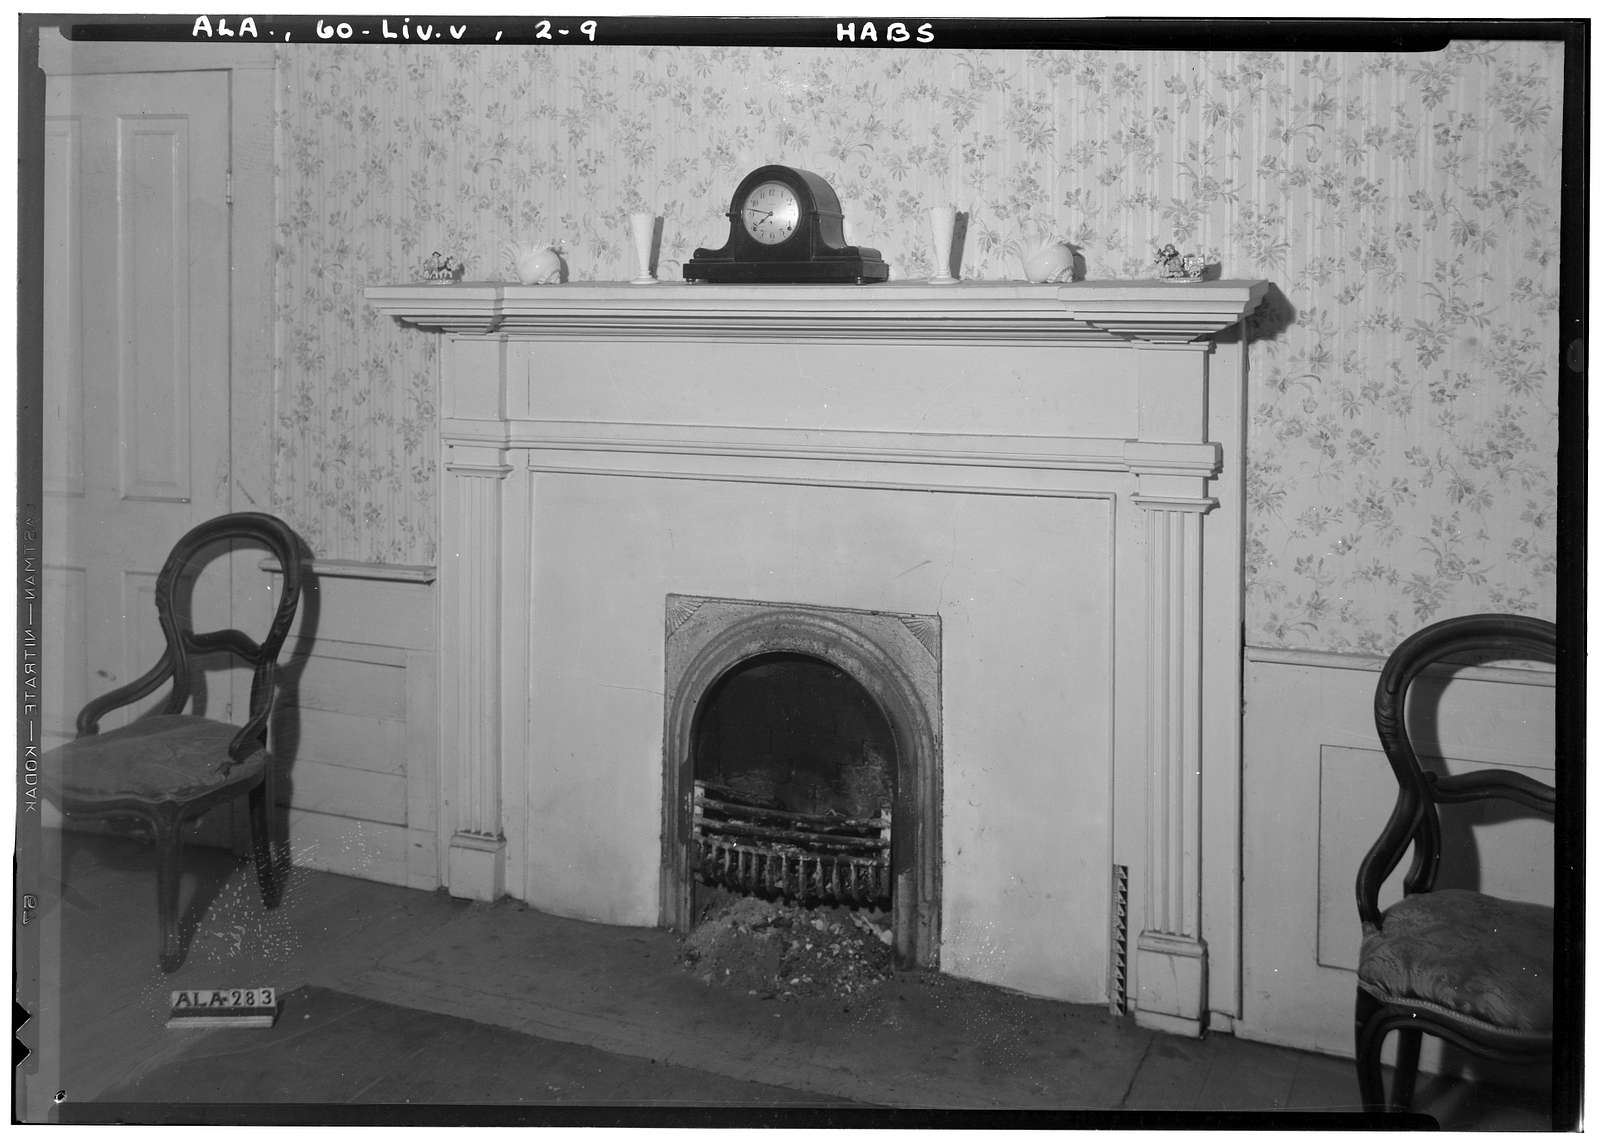 John H. Sherard House, State Road 28, Livingston, Sumter County, AL